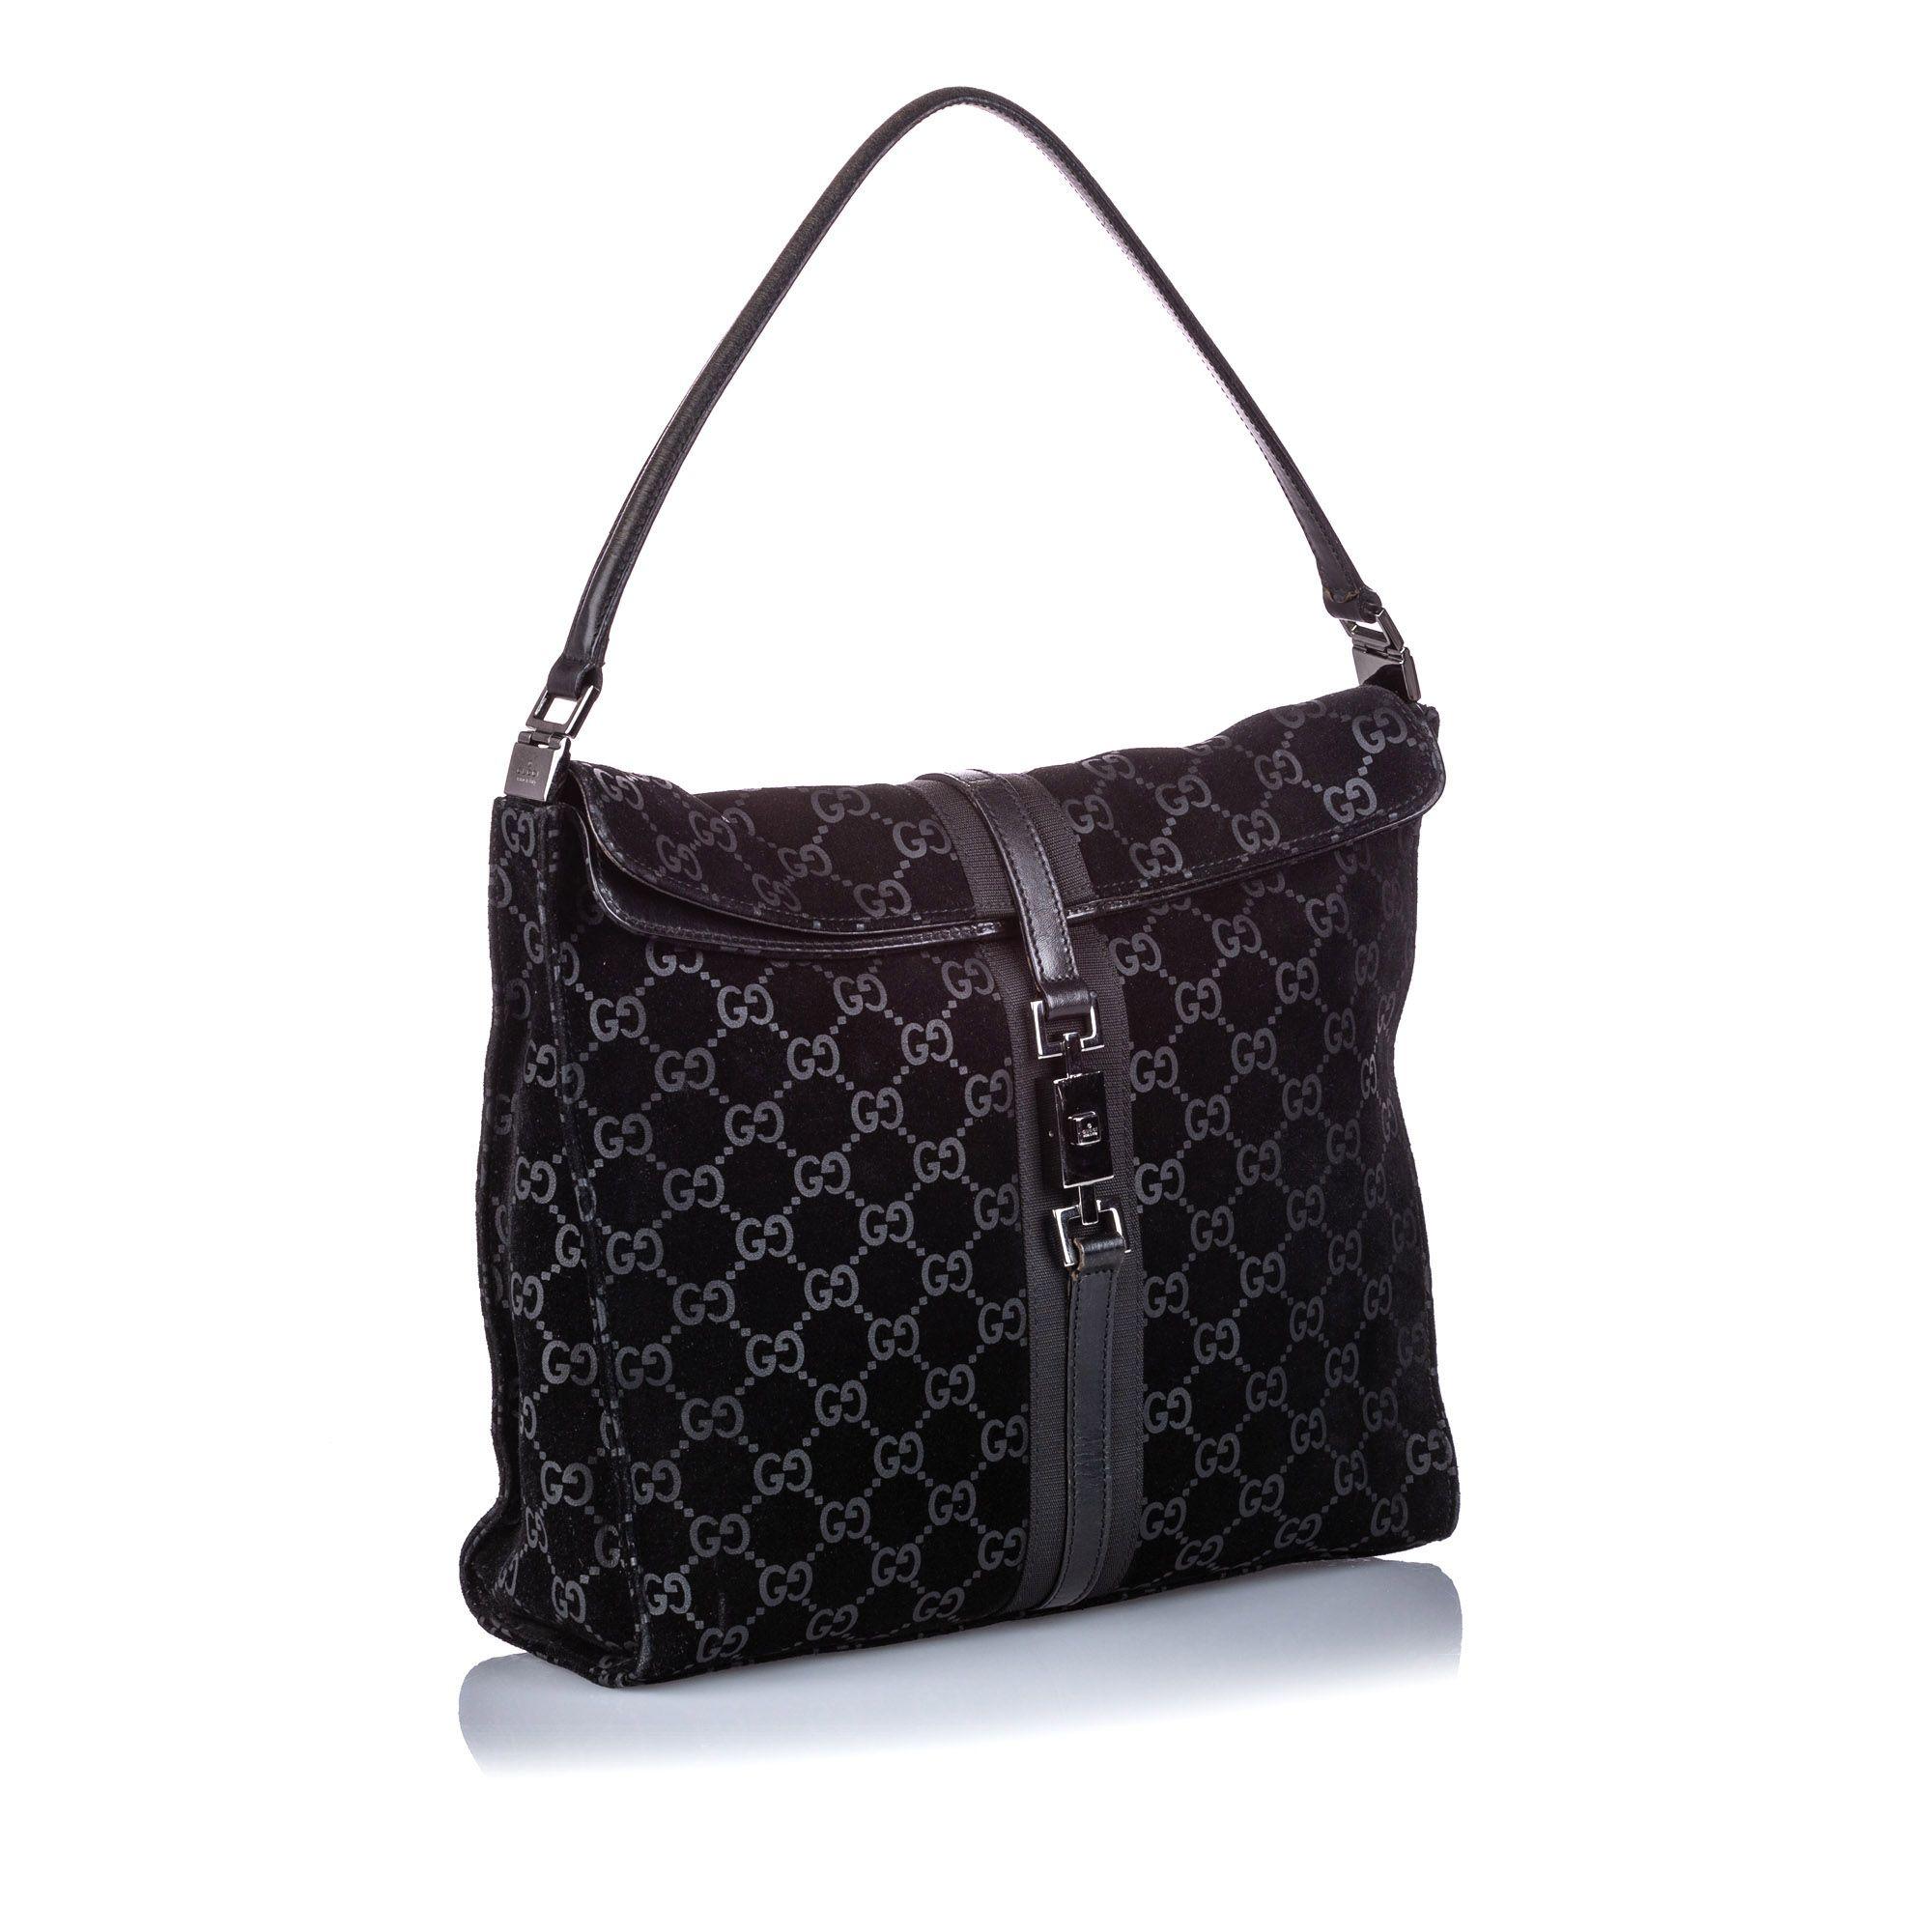 Vintage Gucci Guccissima Suede Jackie Flap Bag Black